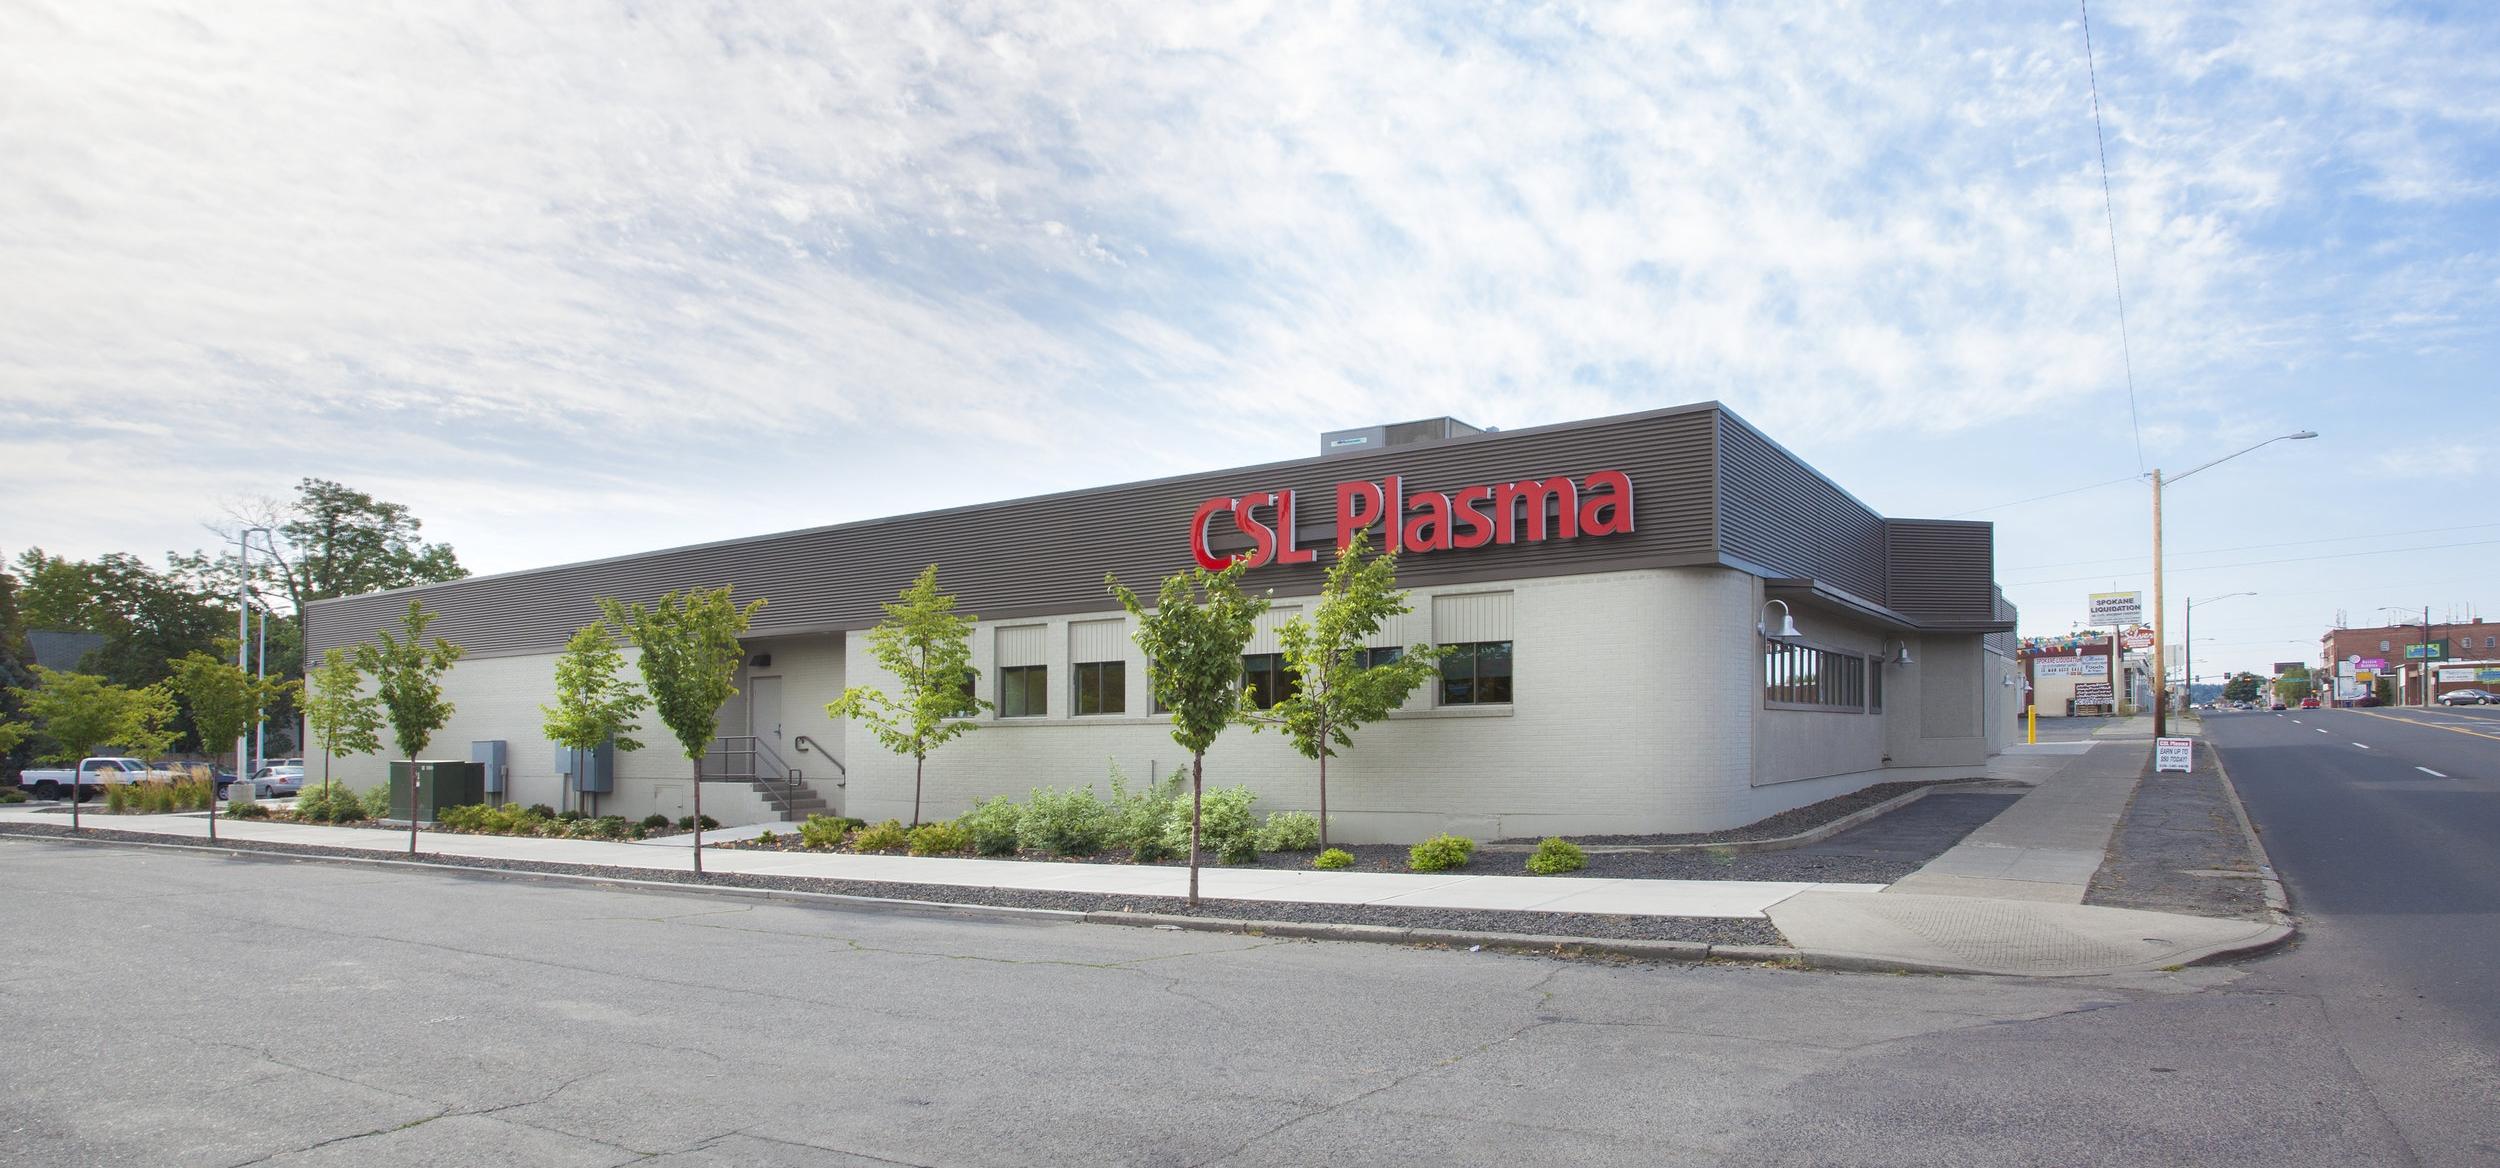 Single Tenant NNN Leased Property in North Spokane  Sale: $2,000,000